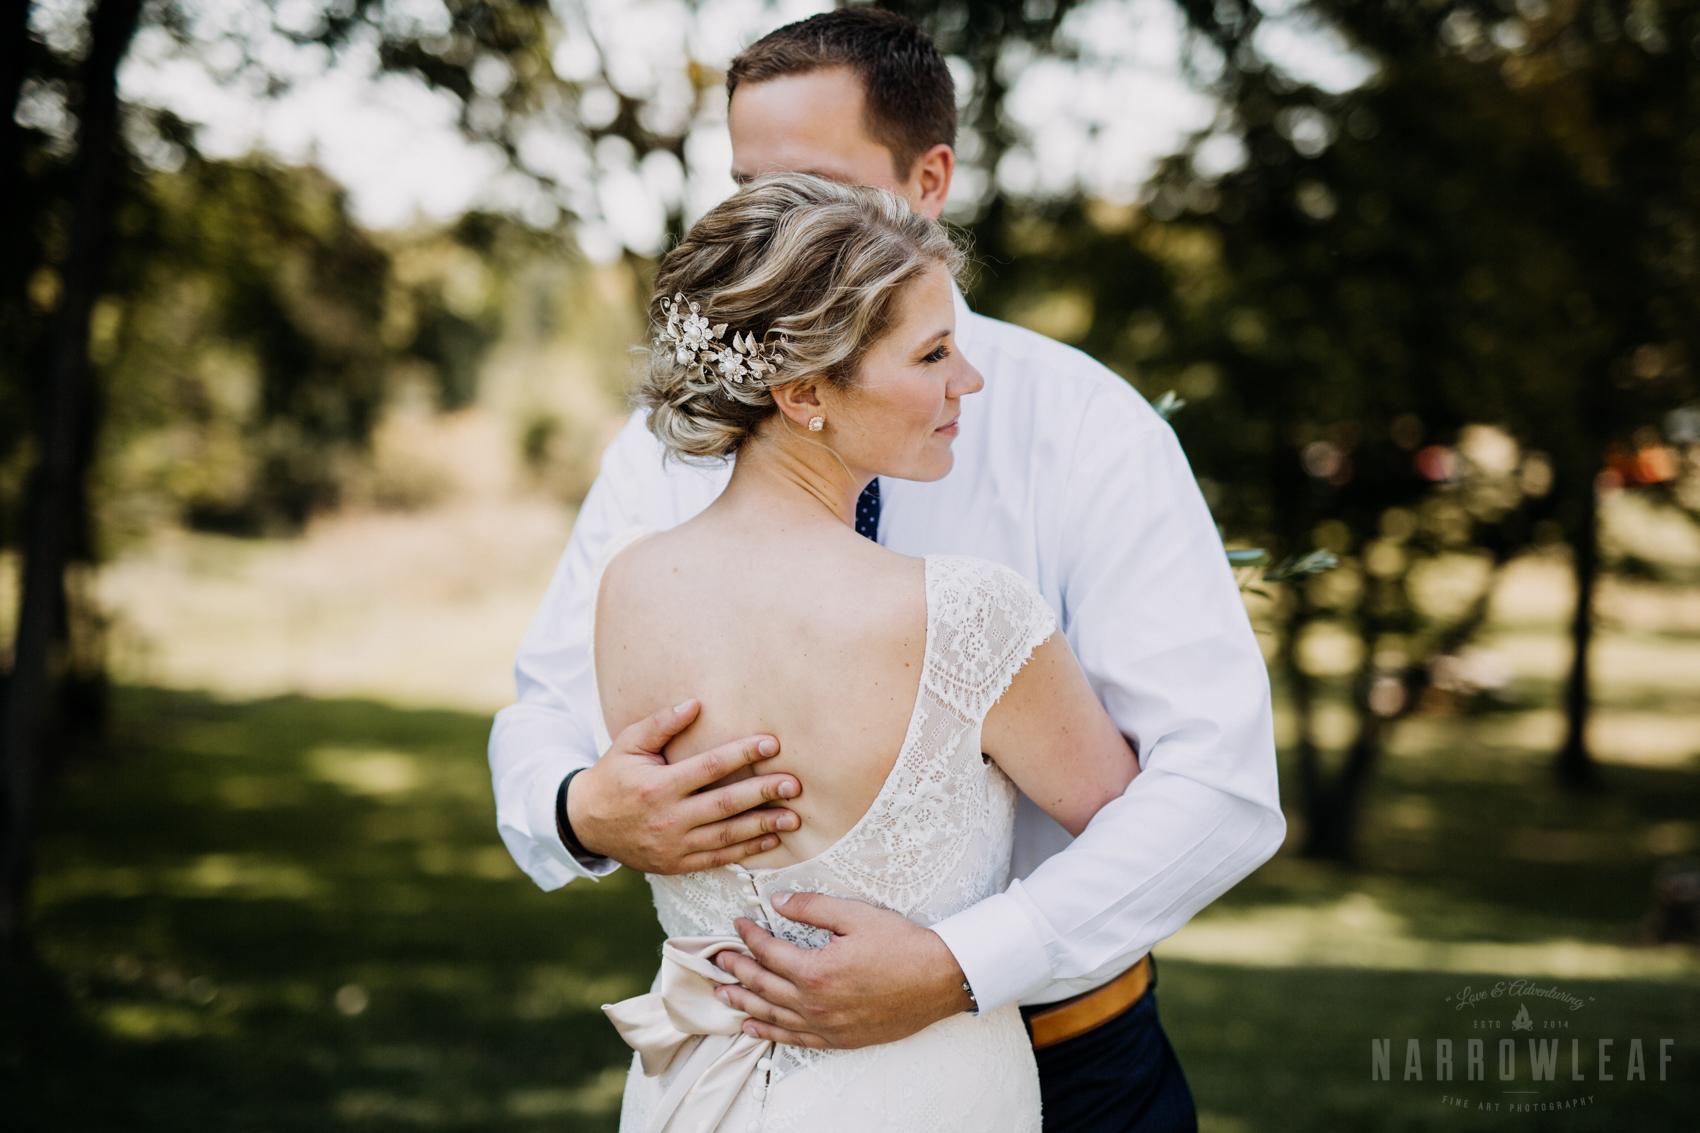 bride-groom-classy-wedding-photos-outdoors-33.jpg